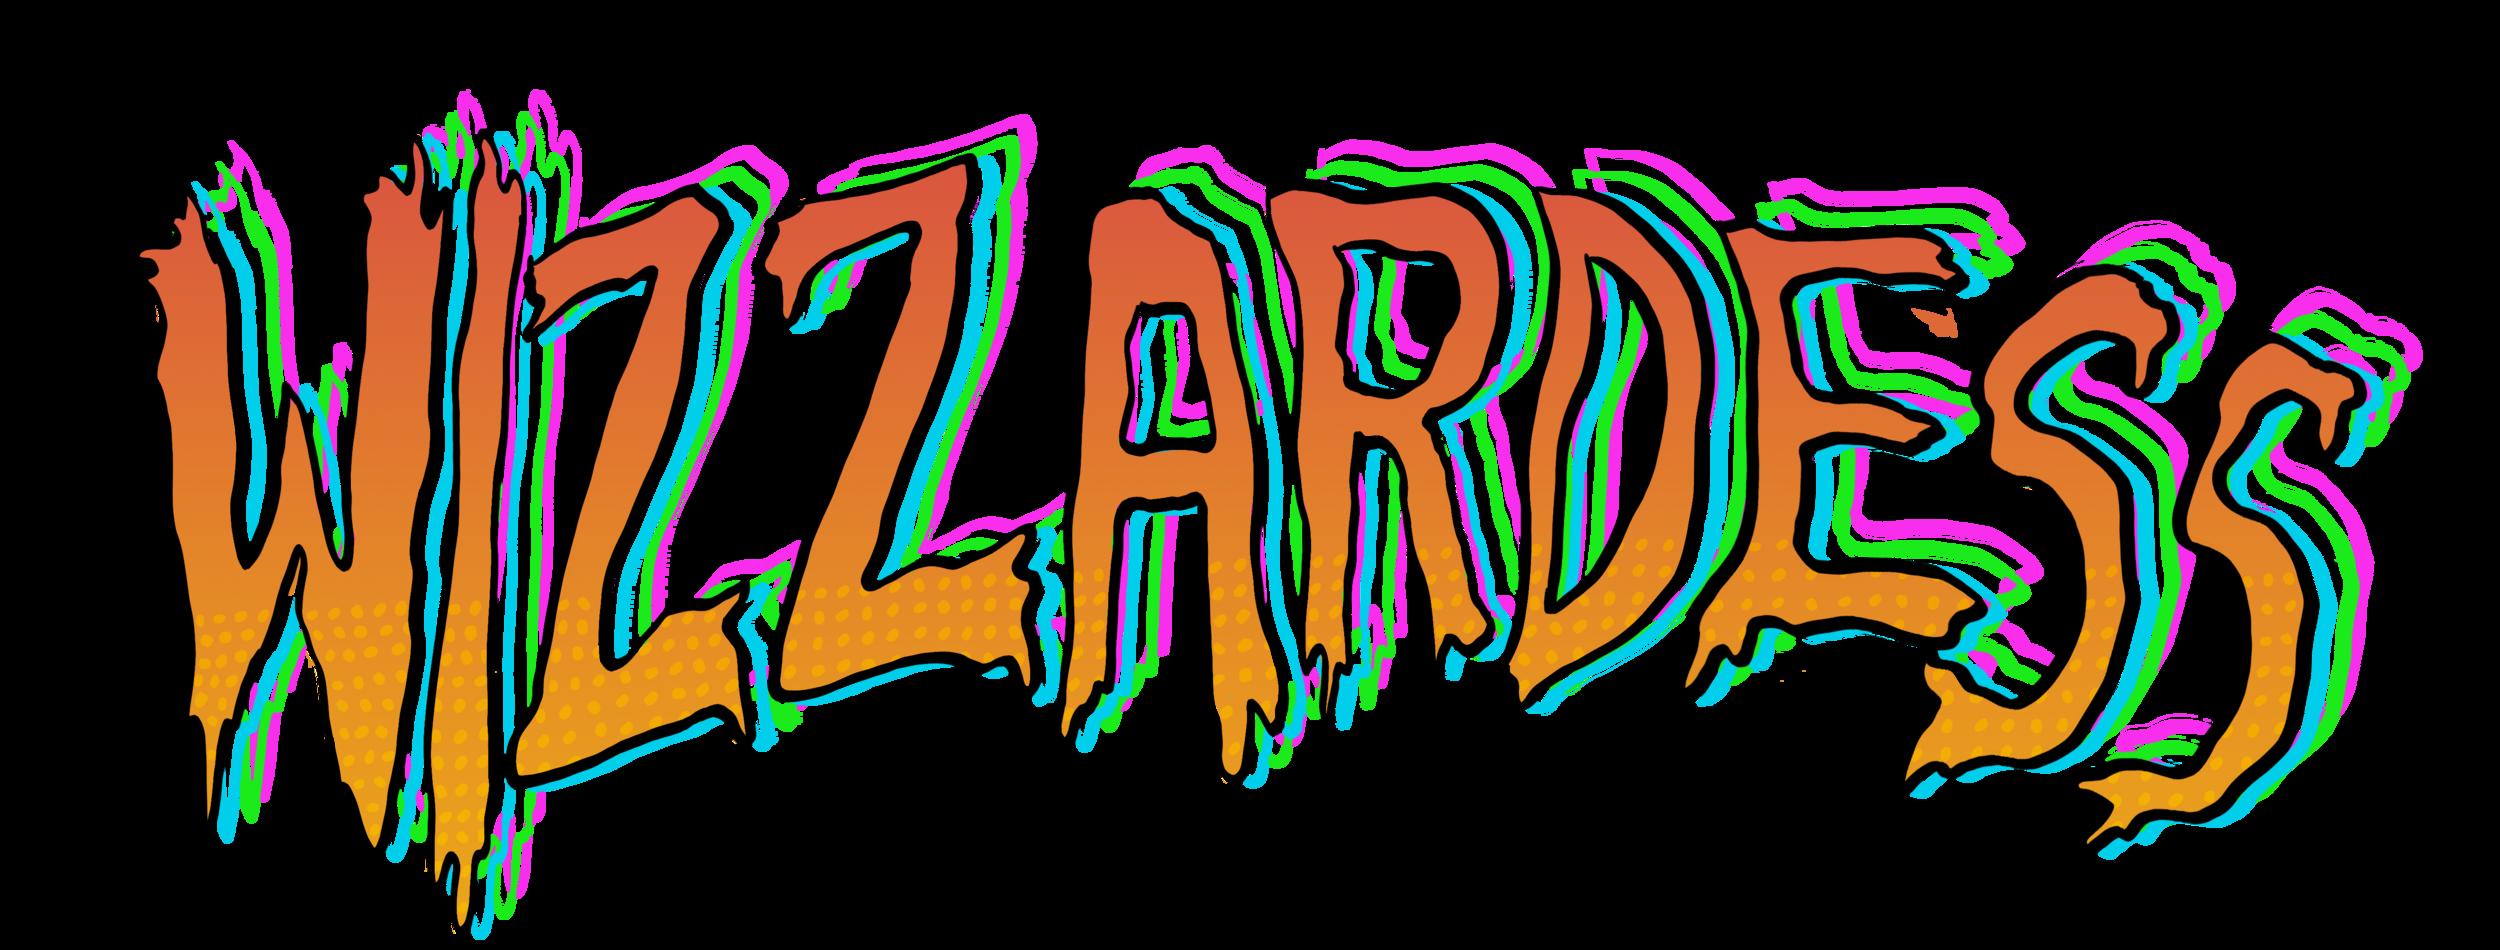 Wizzardess Logo.png